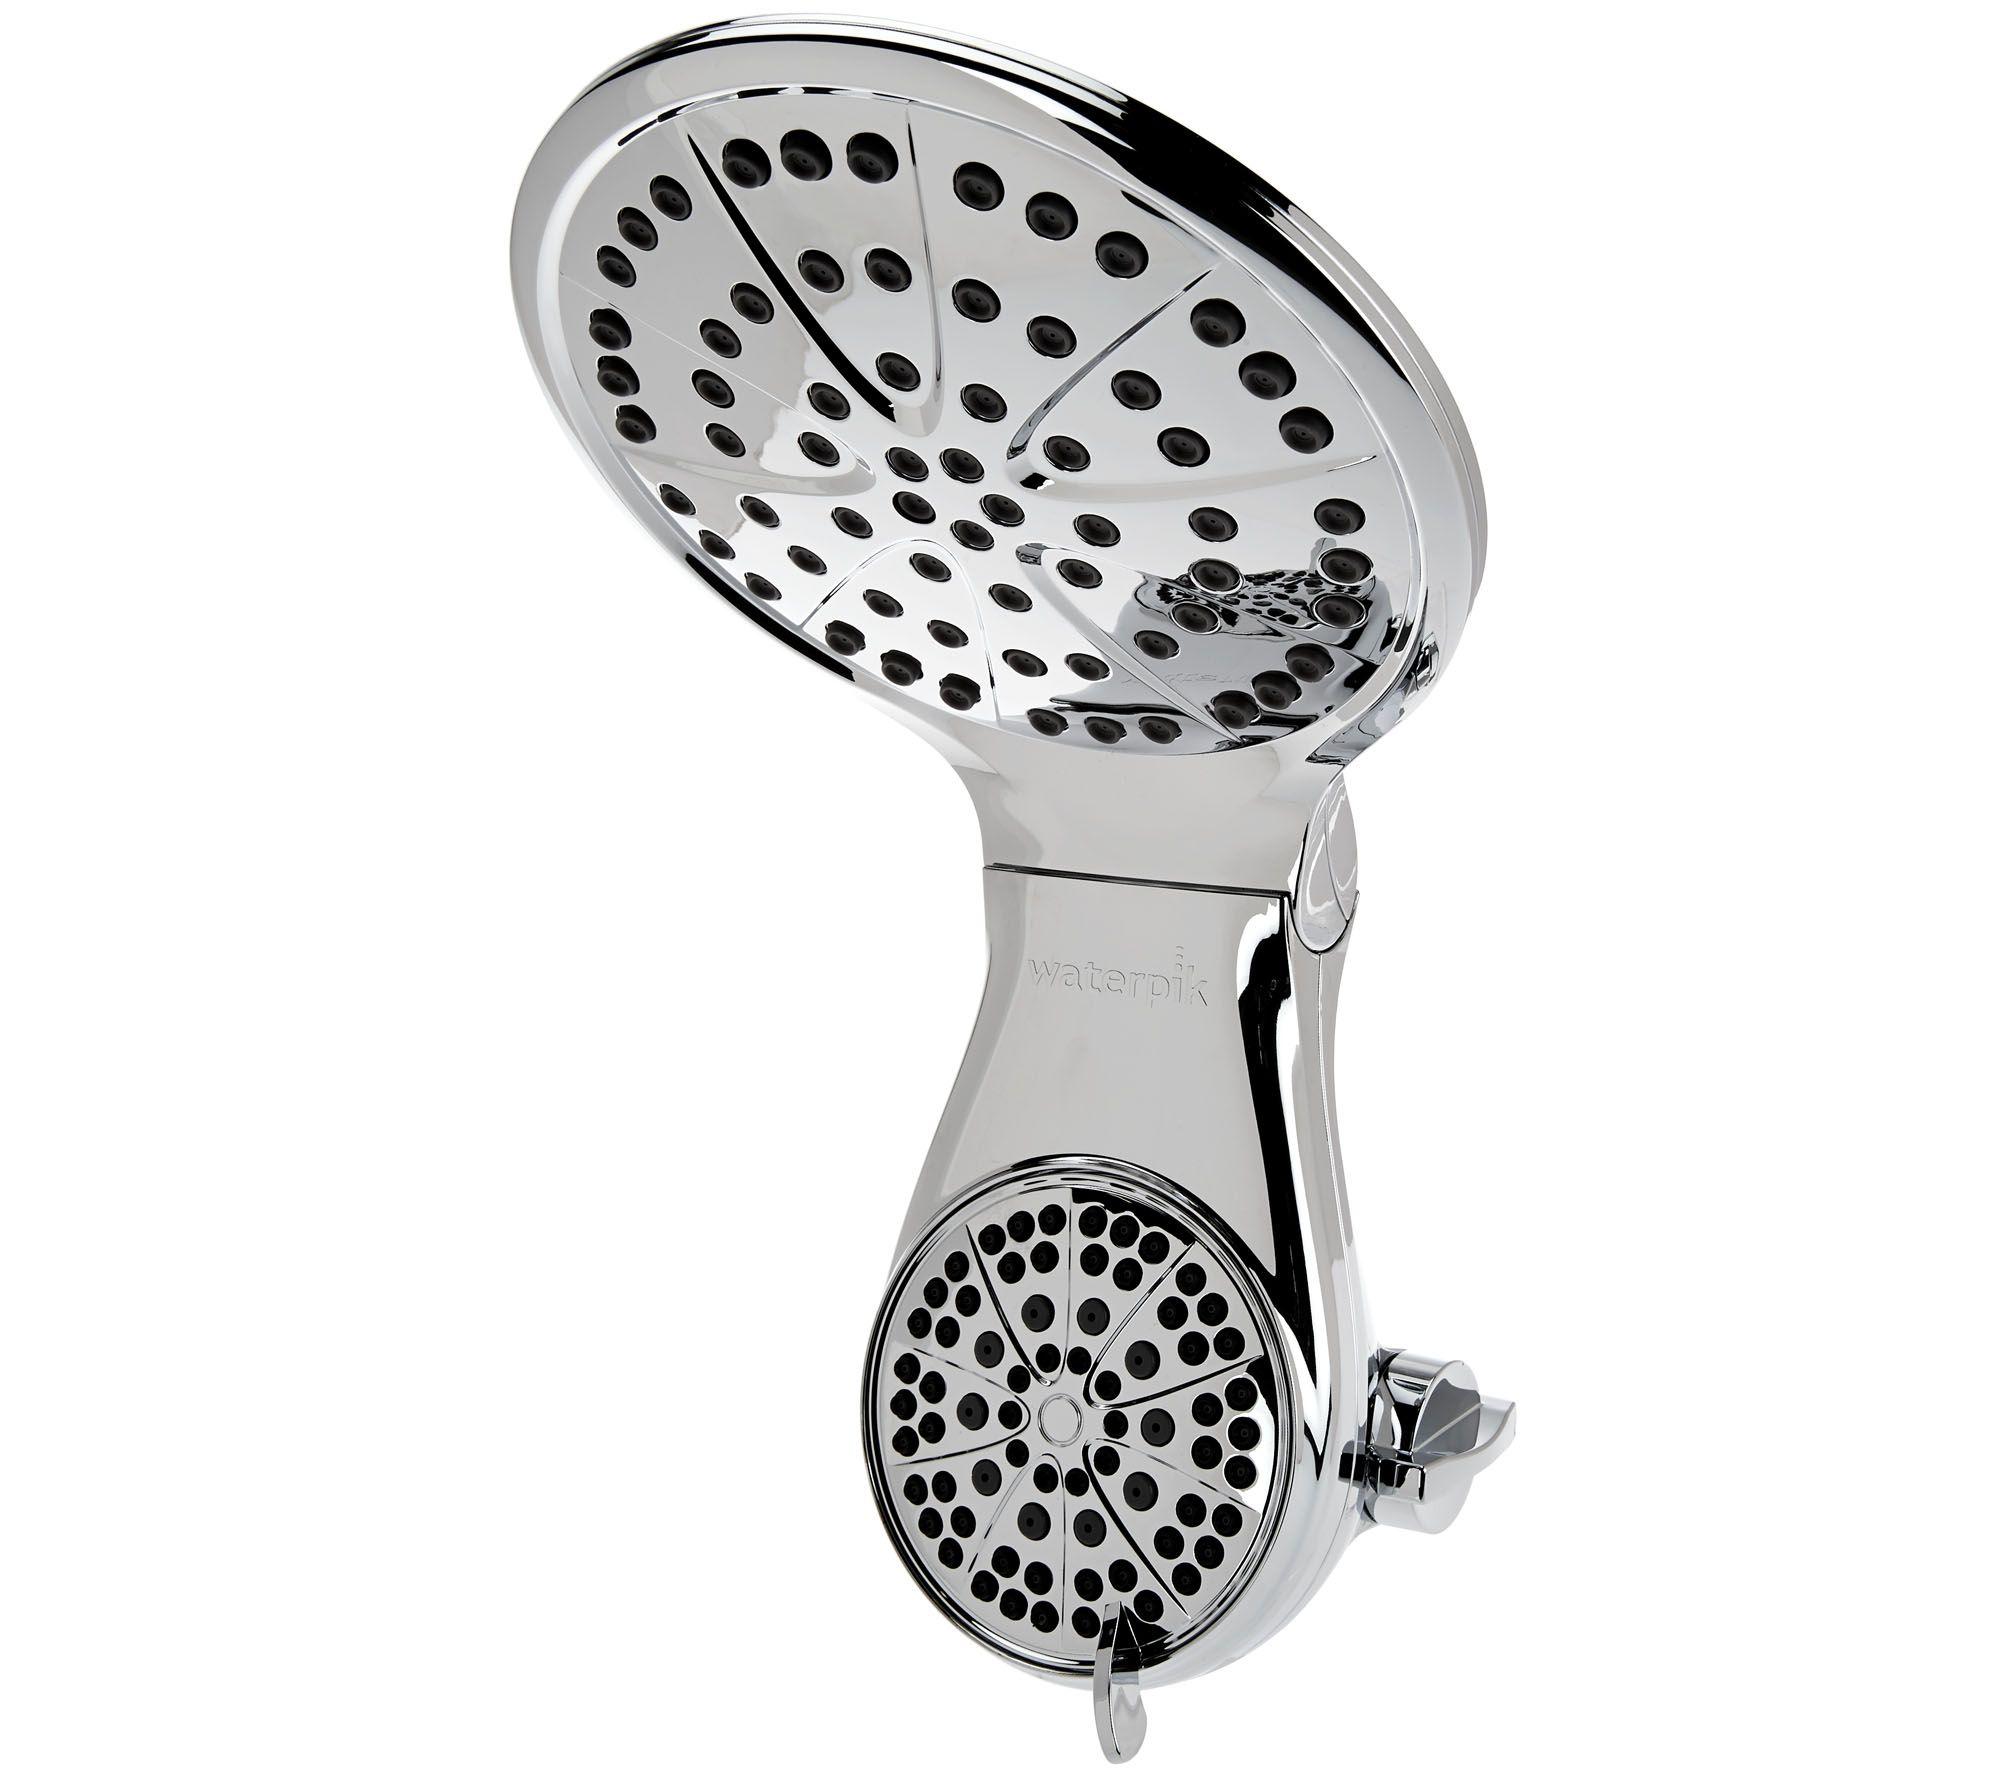 Waterpik Dualspray Drencher Showerhead w/ 7 Settings - Page 1 ...